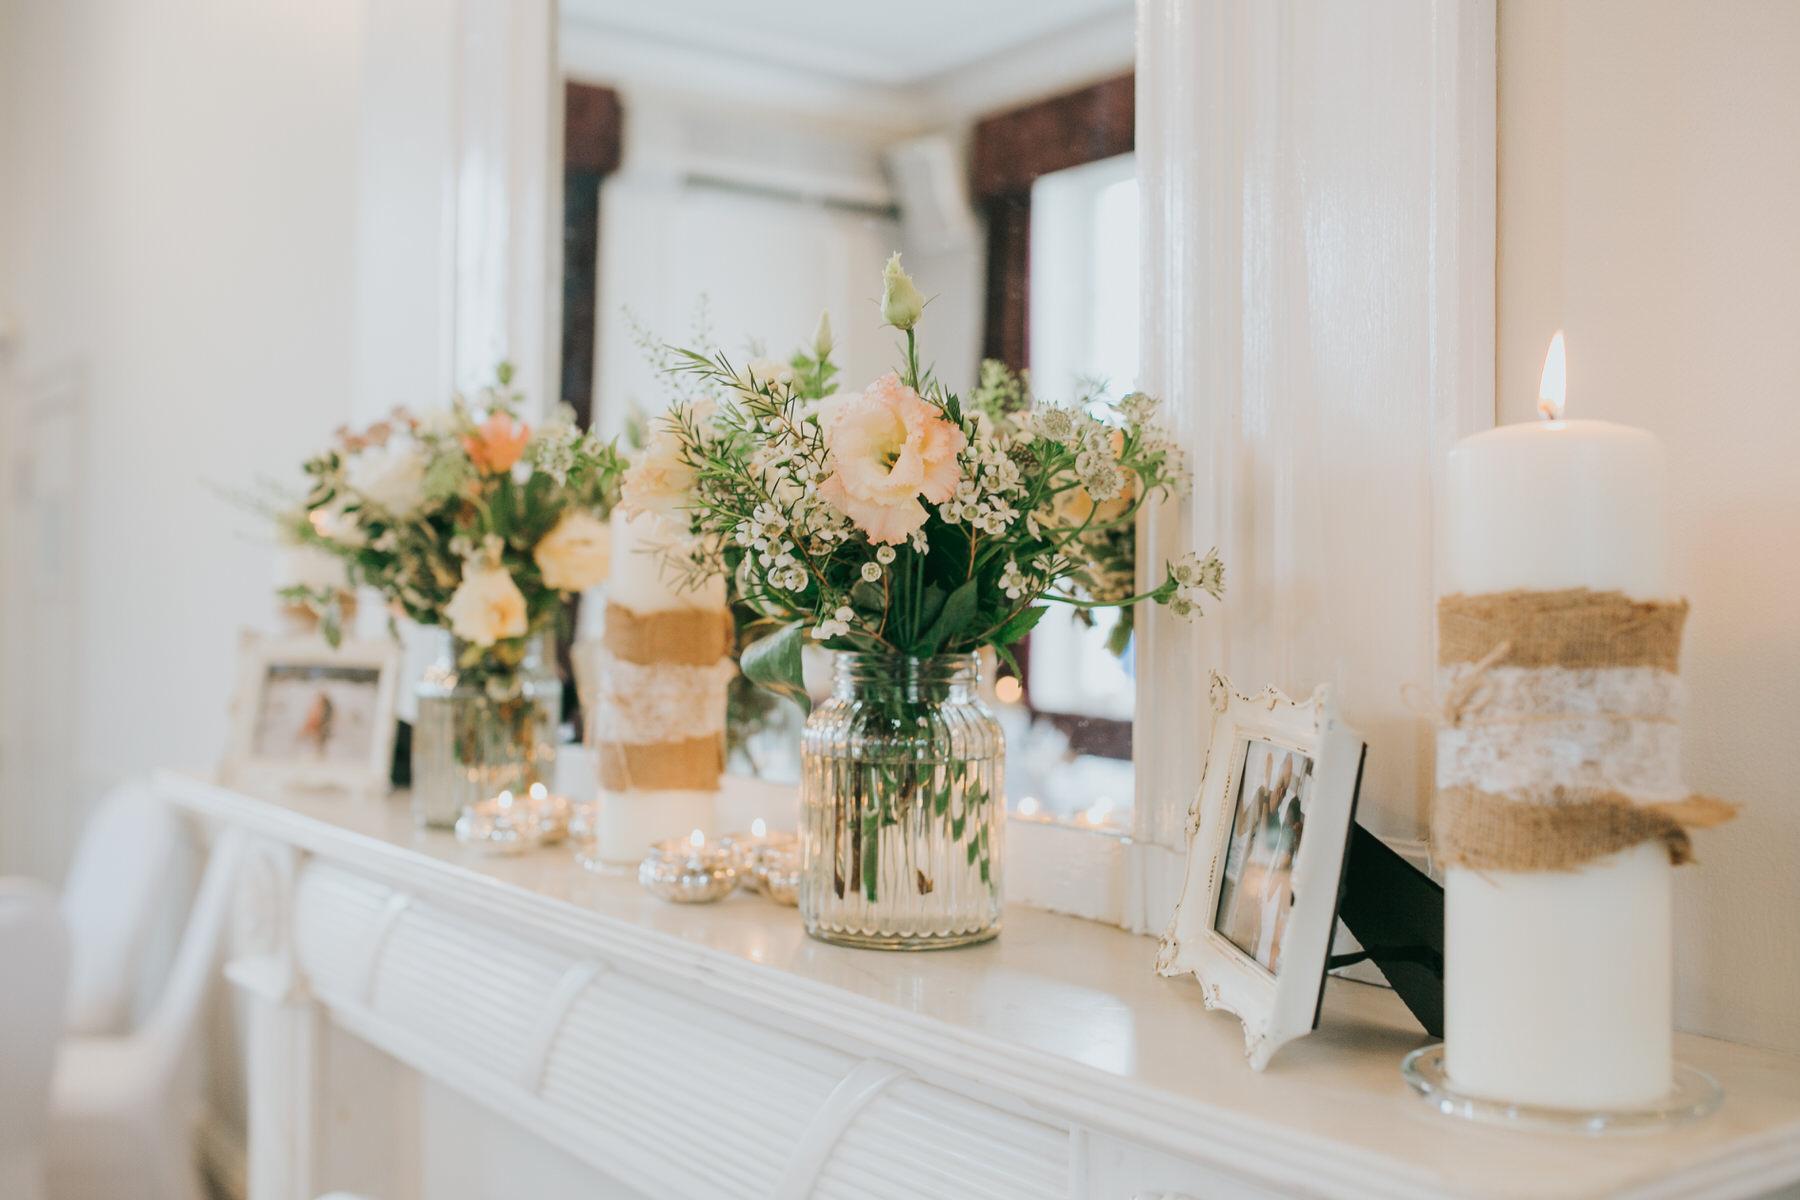 155-Belair House Dulwich wedding reception decor.jpg